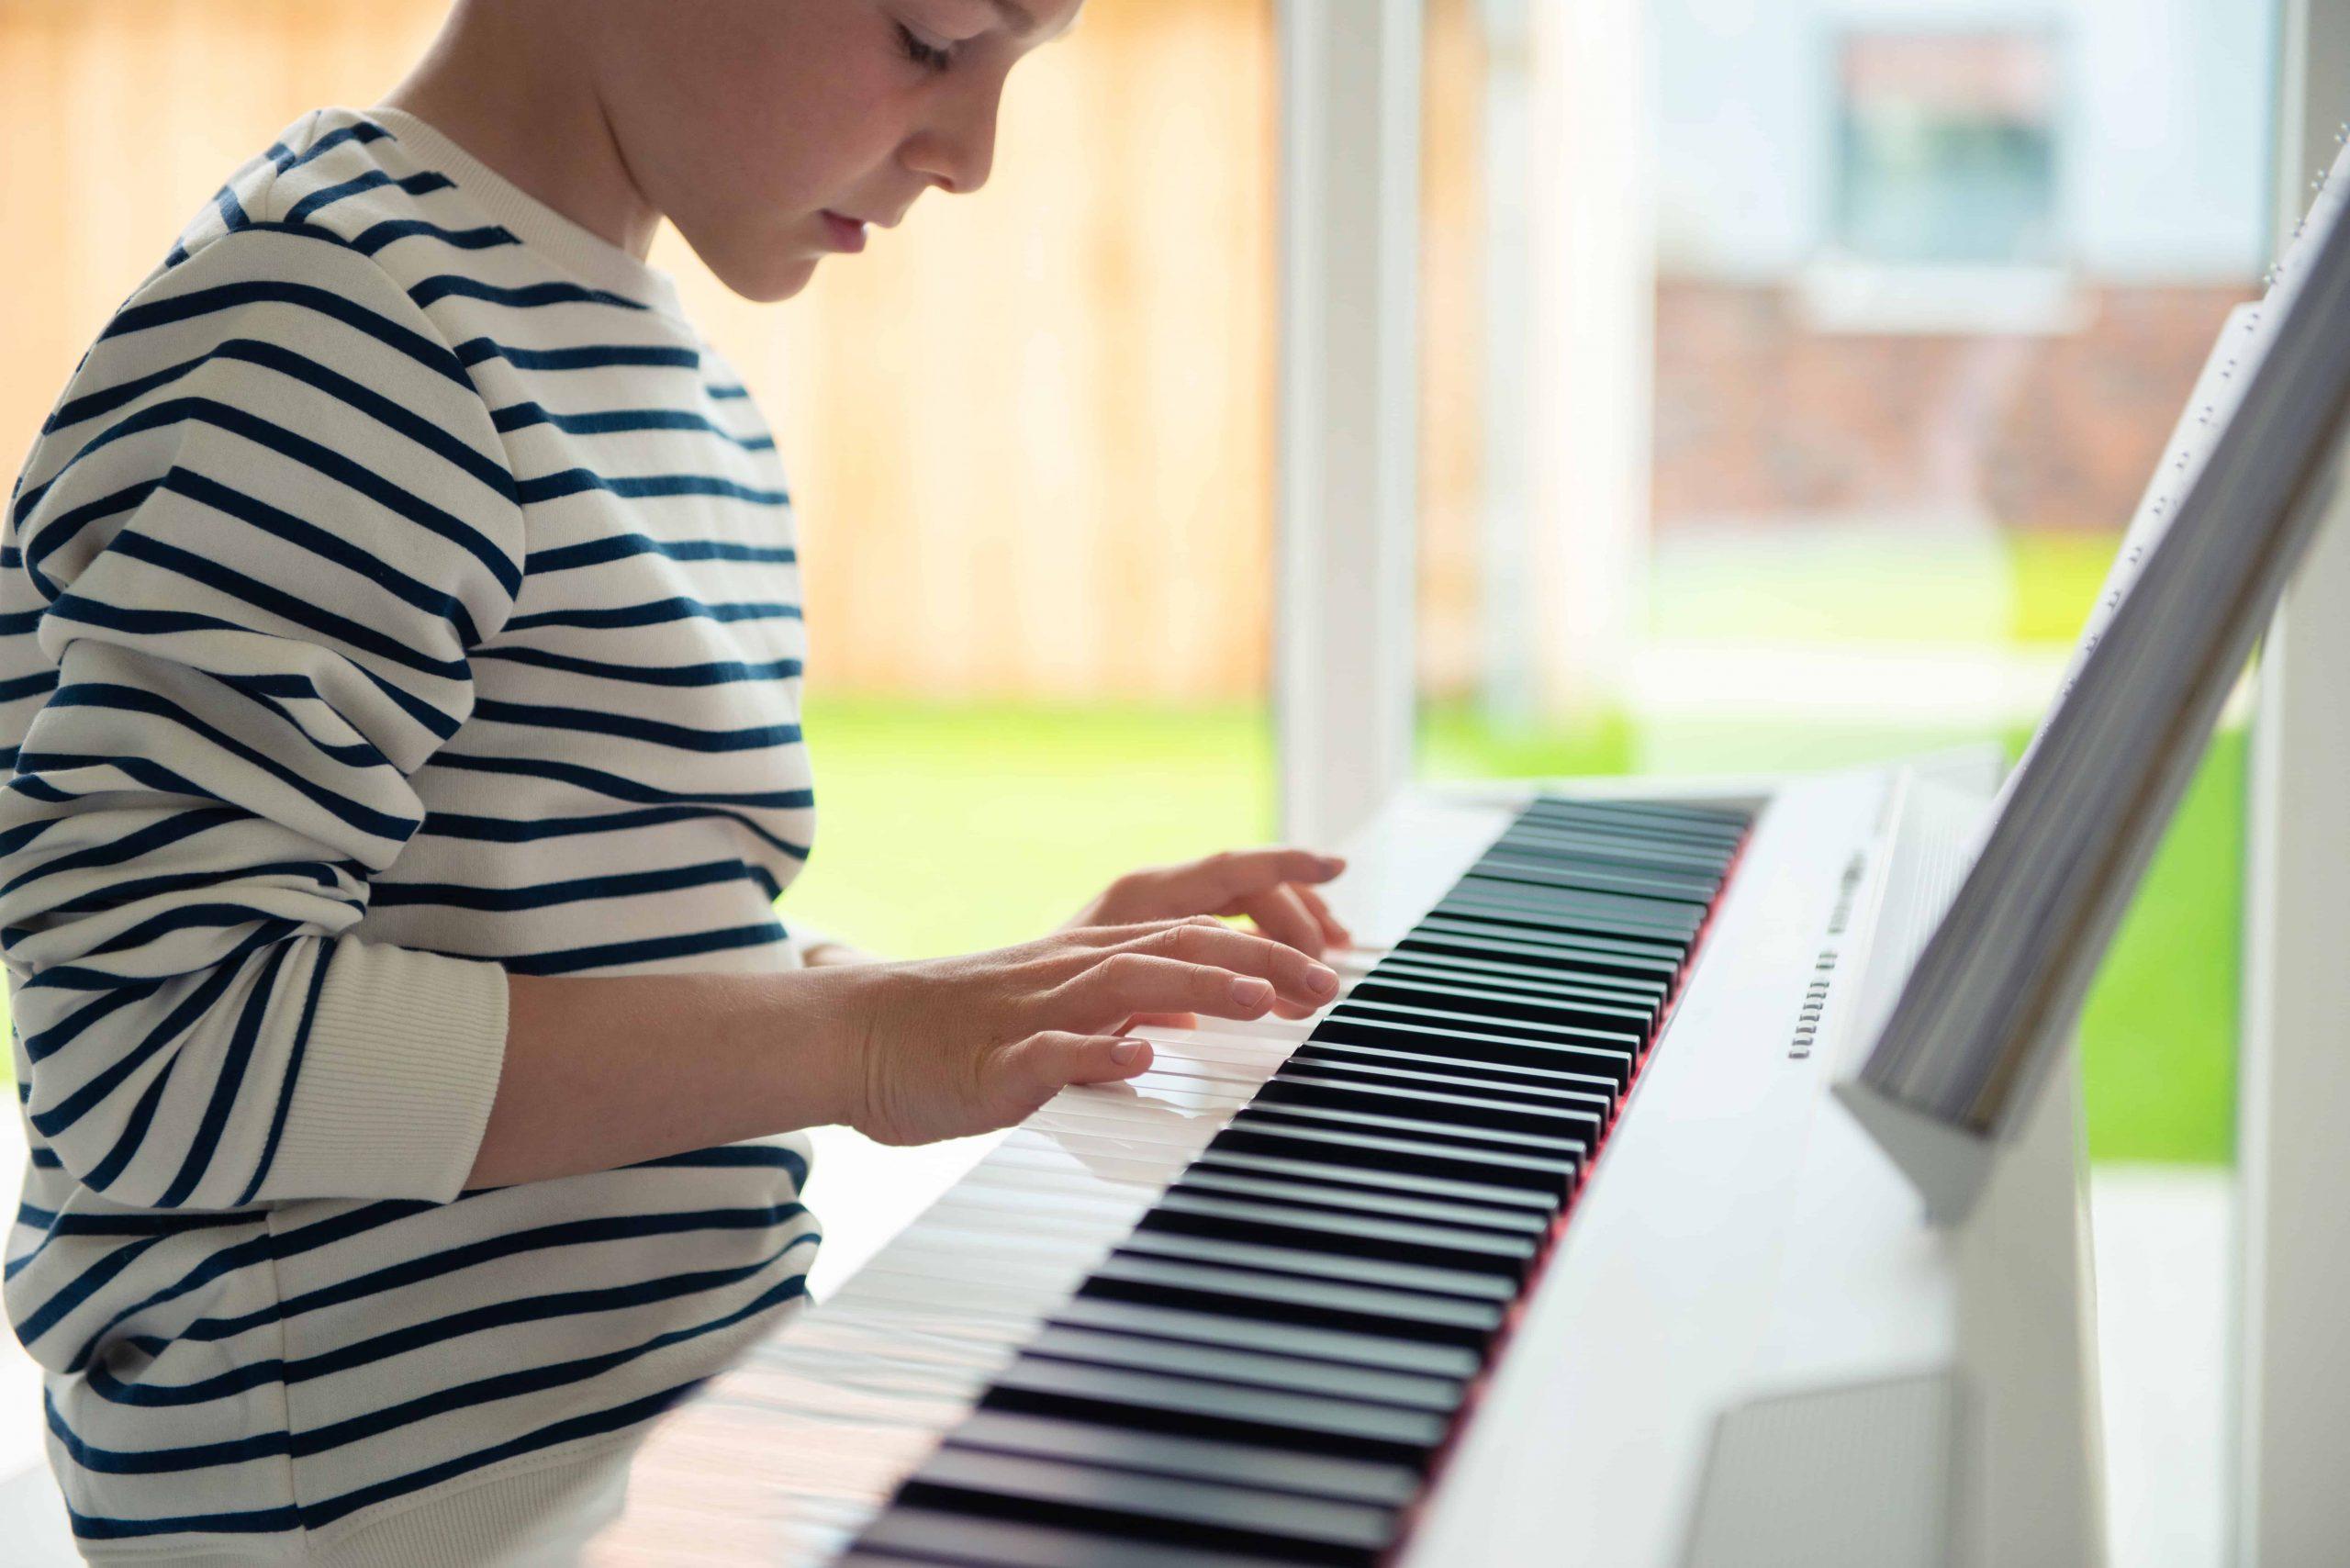 E-Piano: Test & Empfehlungen (04/21)